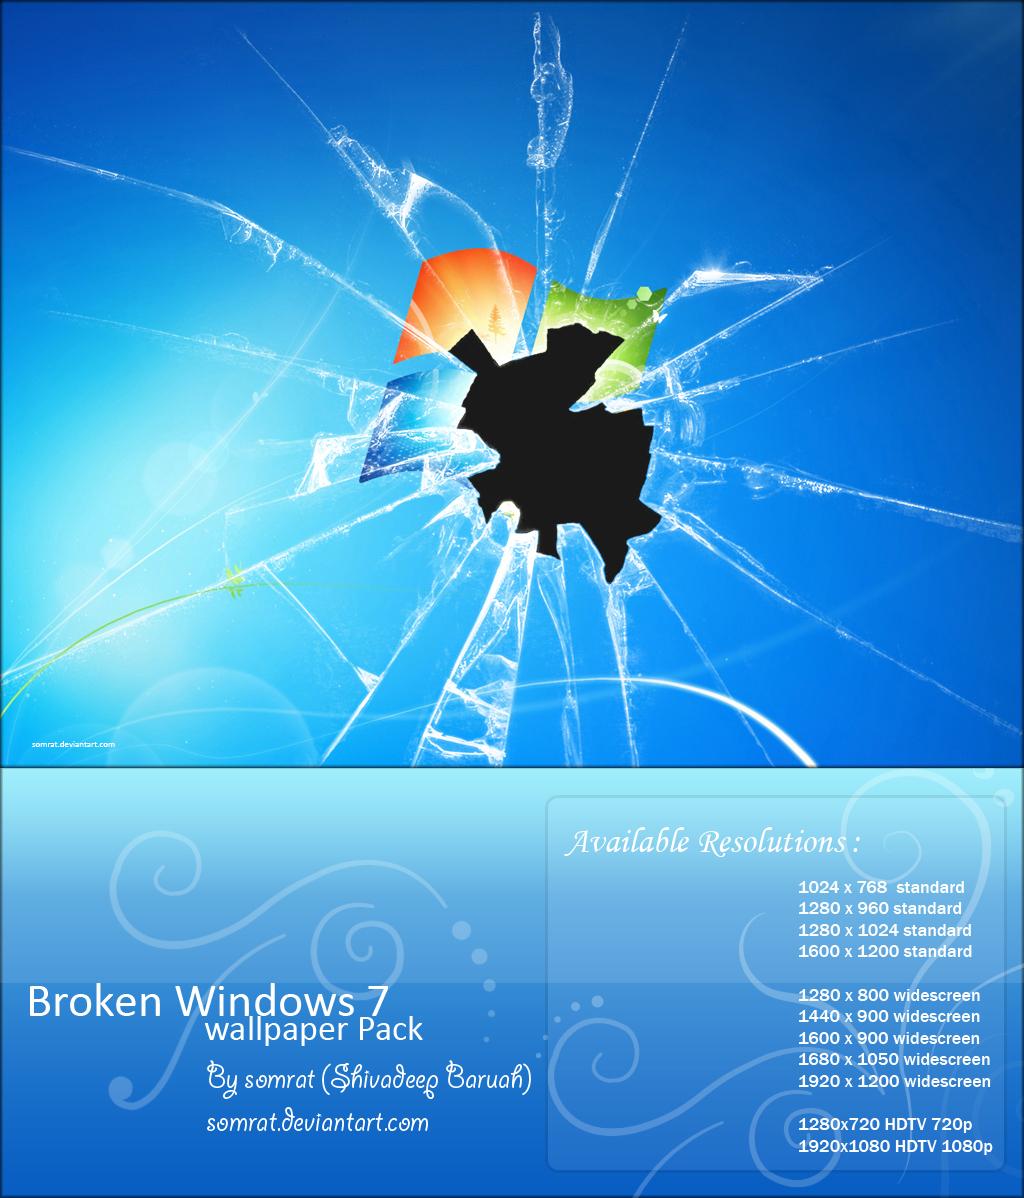 Broken Screen Wallpaper: Hd Cracked Screen Wallpaper